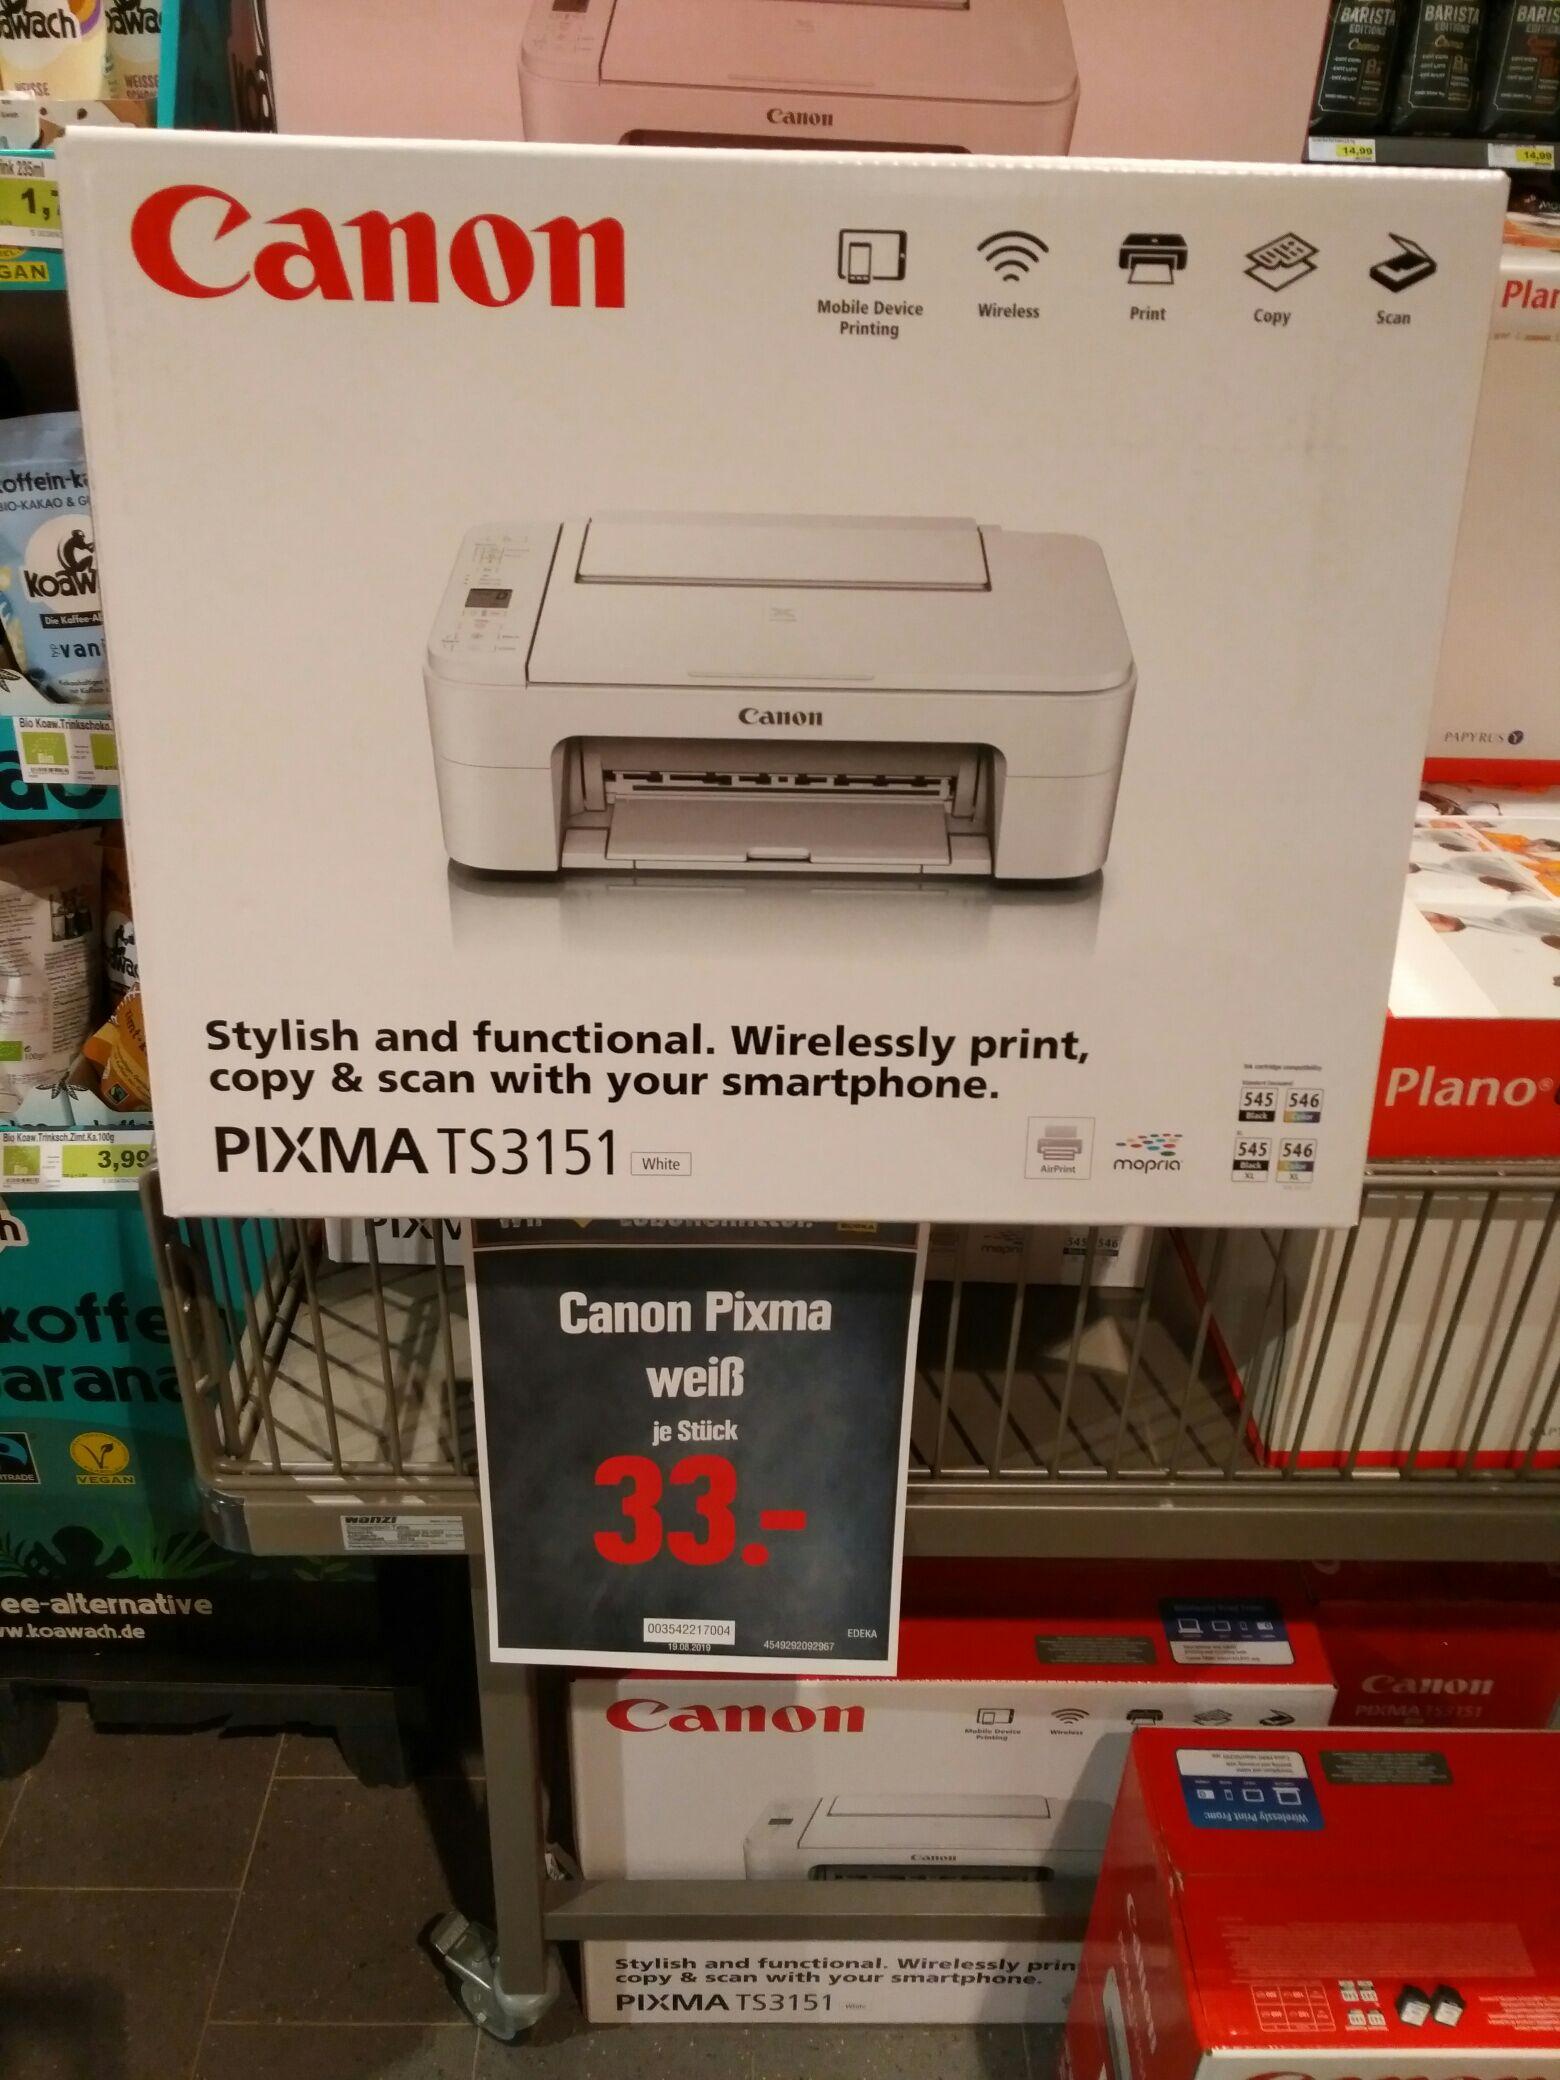 WLAN Drucker Canon Pixma TS3151 für 33,- [Edeka - ggfs lokal Vöhl?]